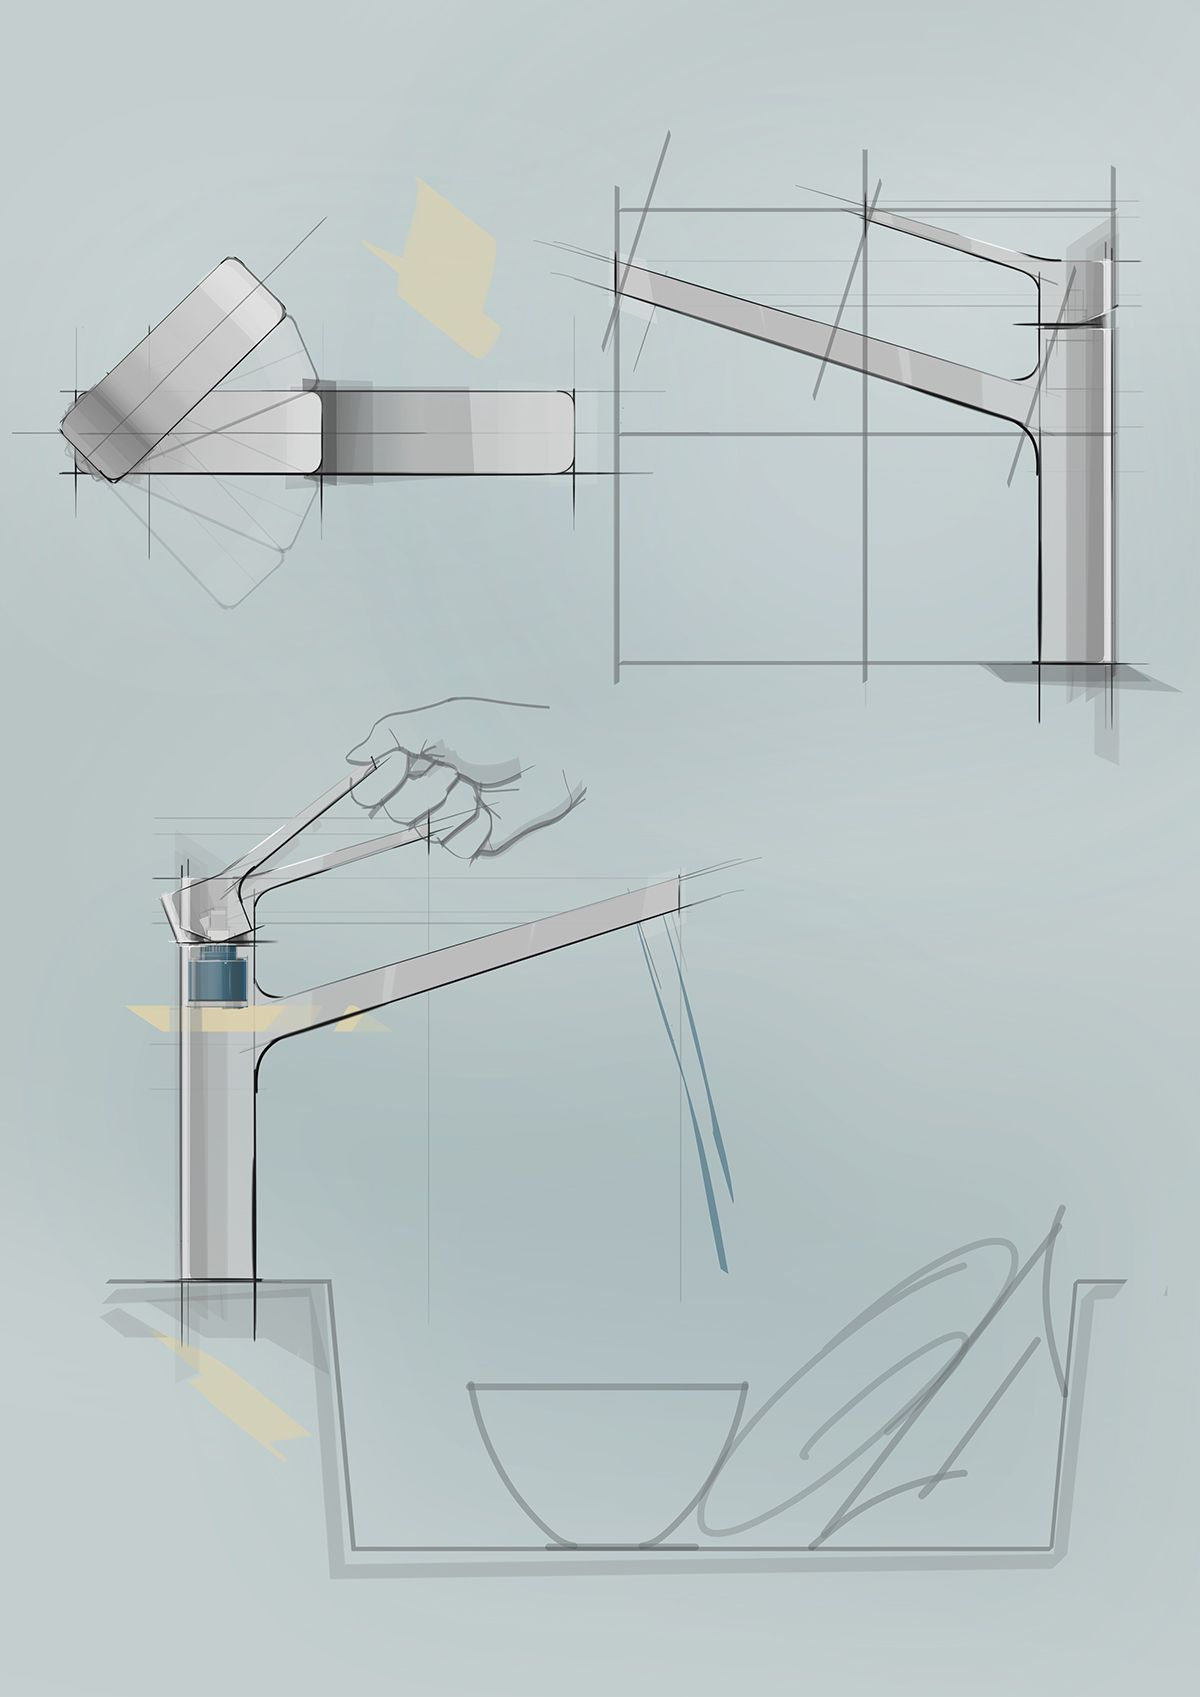 Kitchen Faucet Design Proposal on Behance | Industrial Design ...